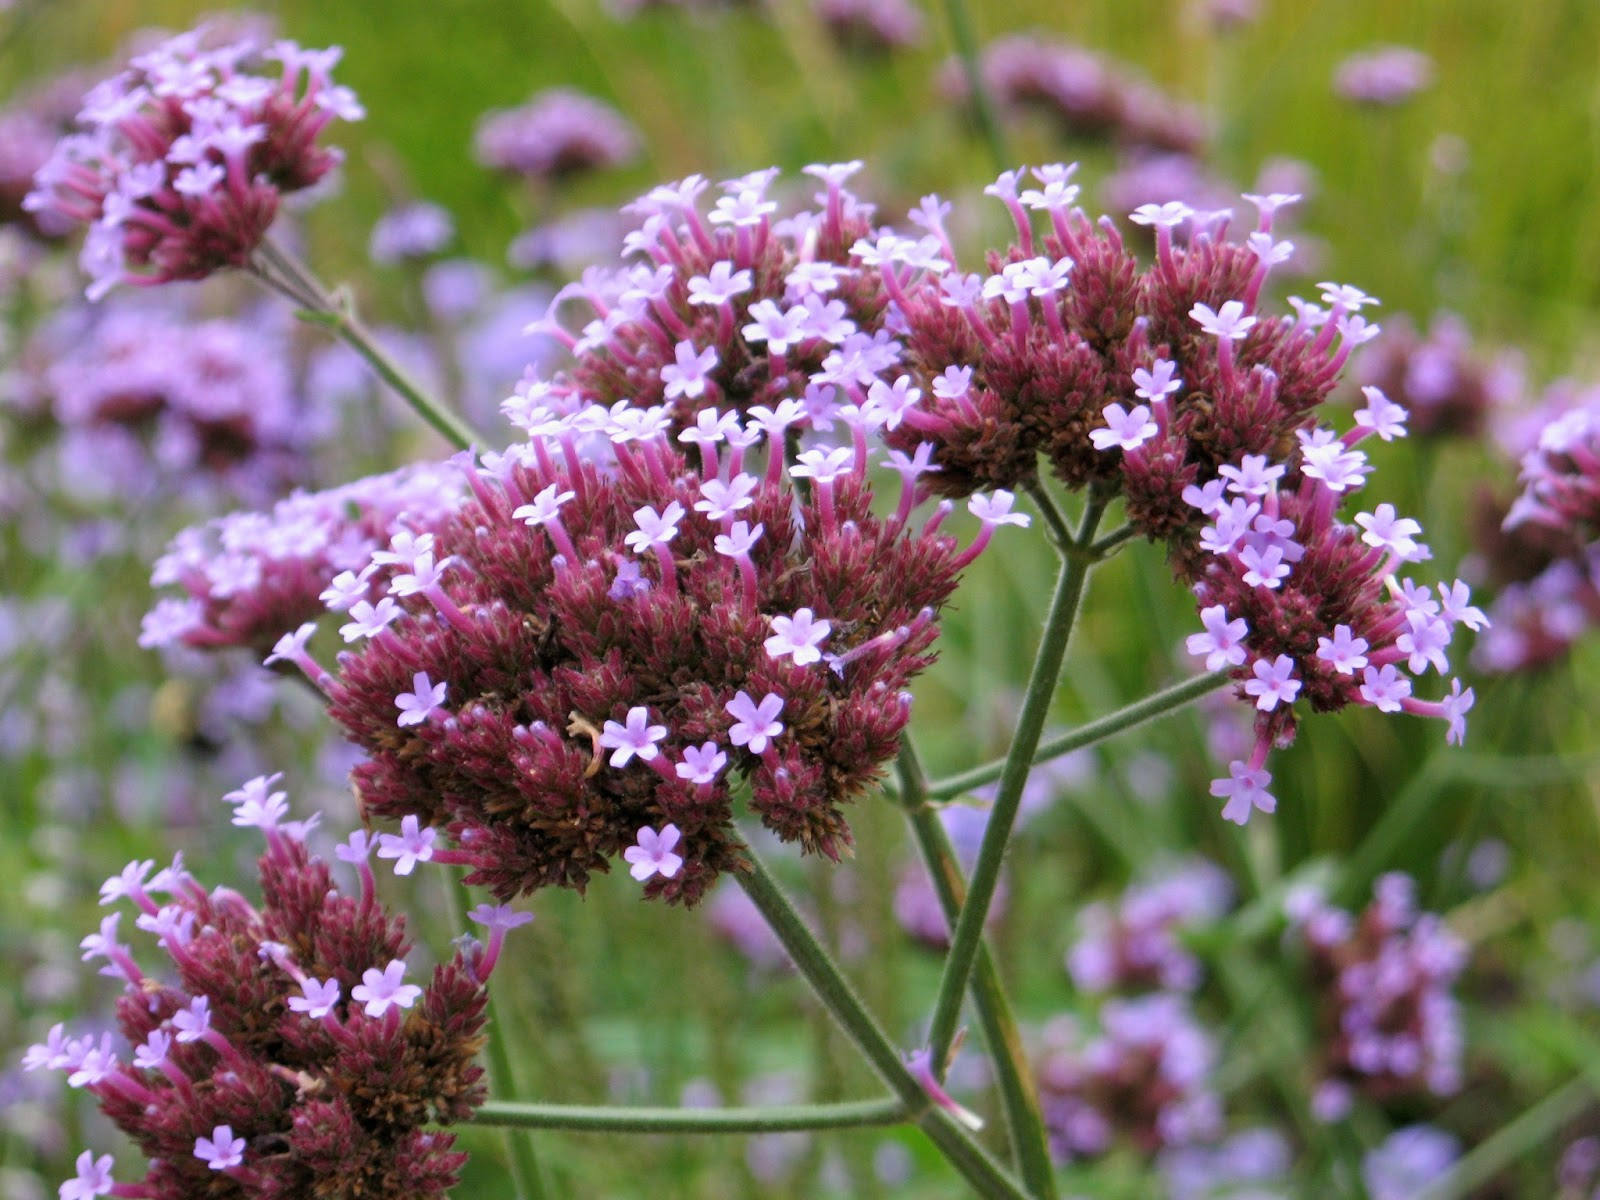 Good Witches Magickal Flowers And Herbs: Verbena Verbena Plant